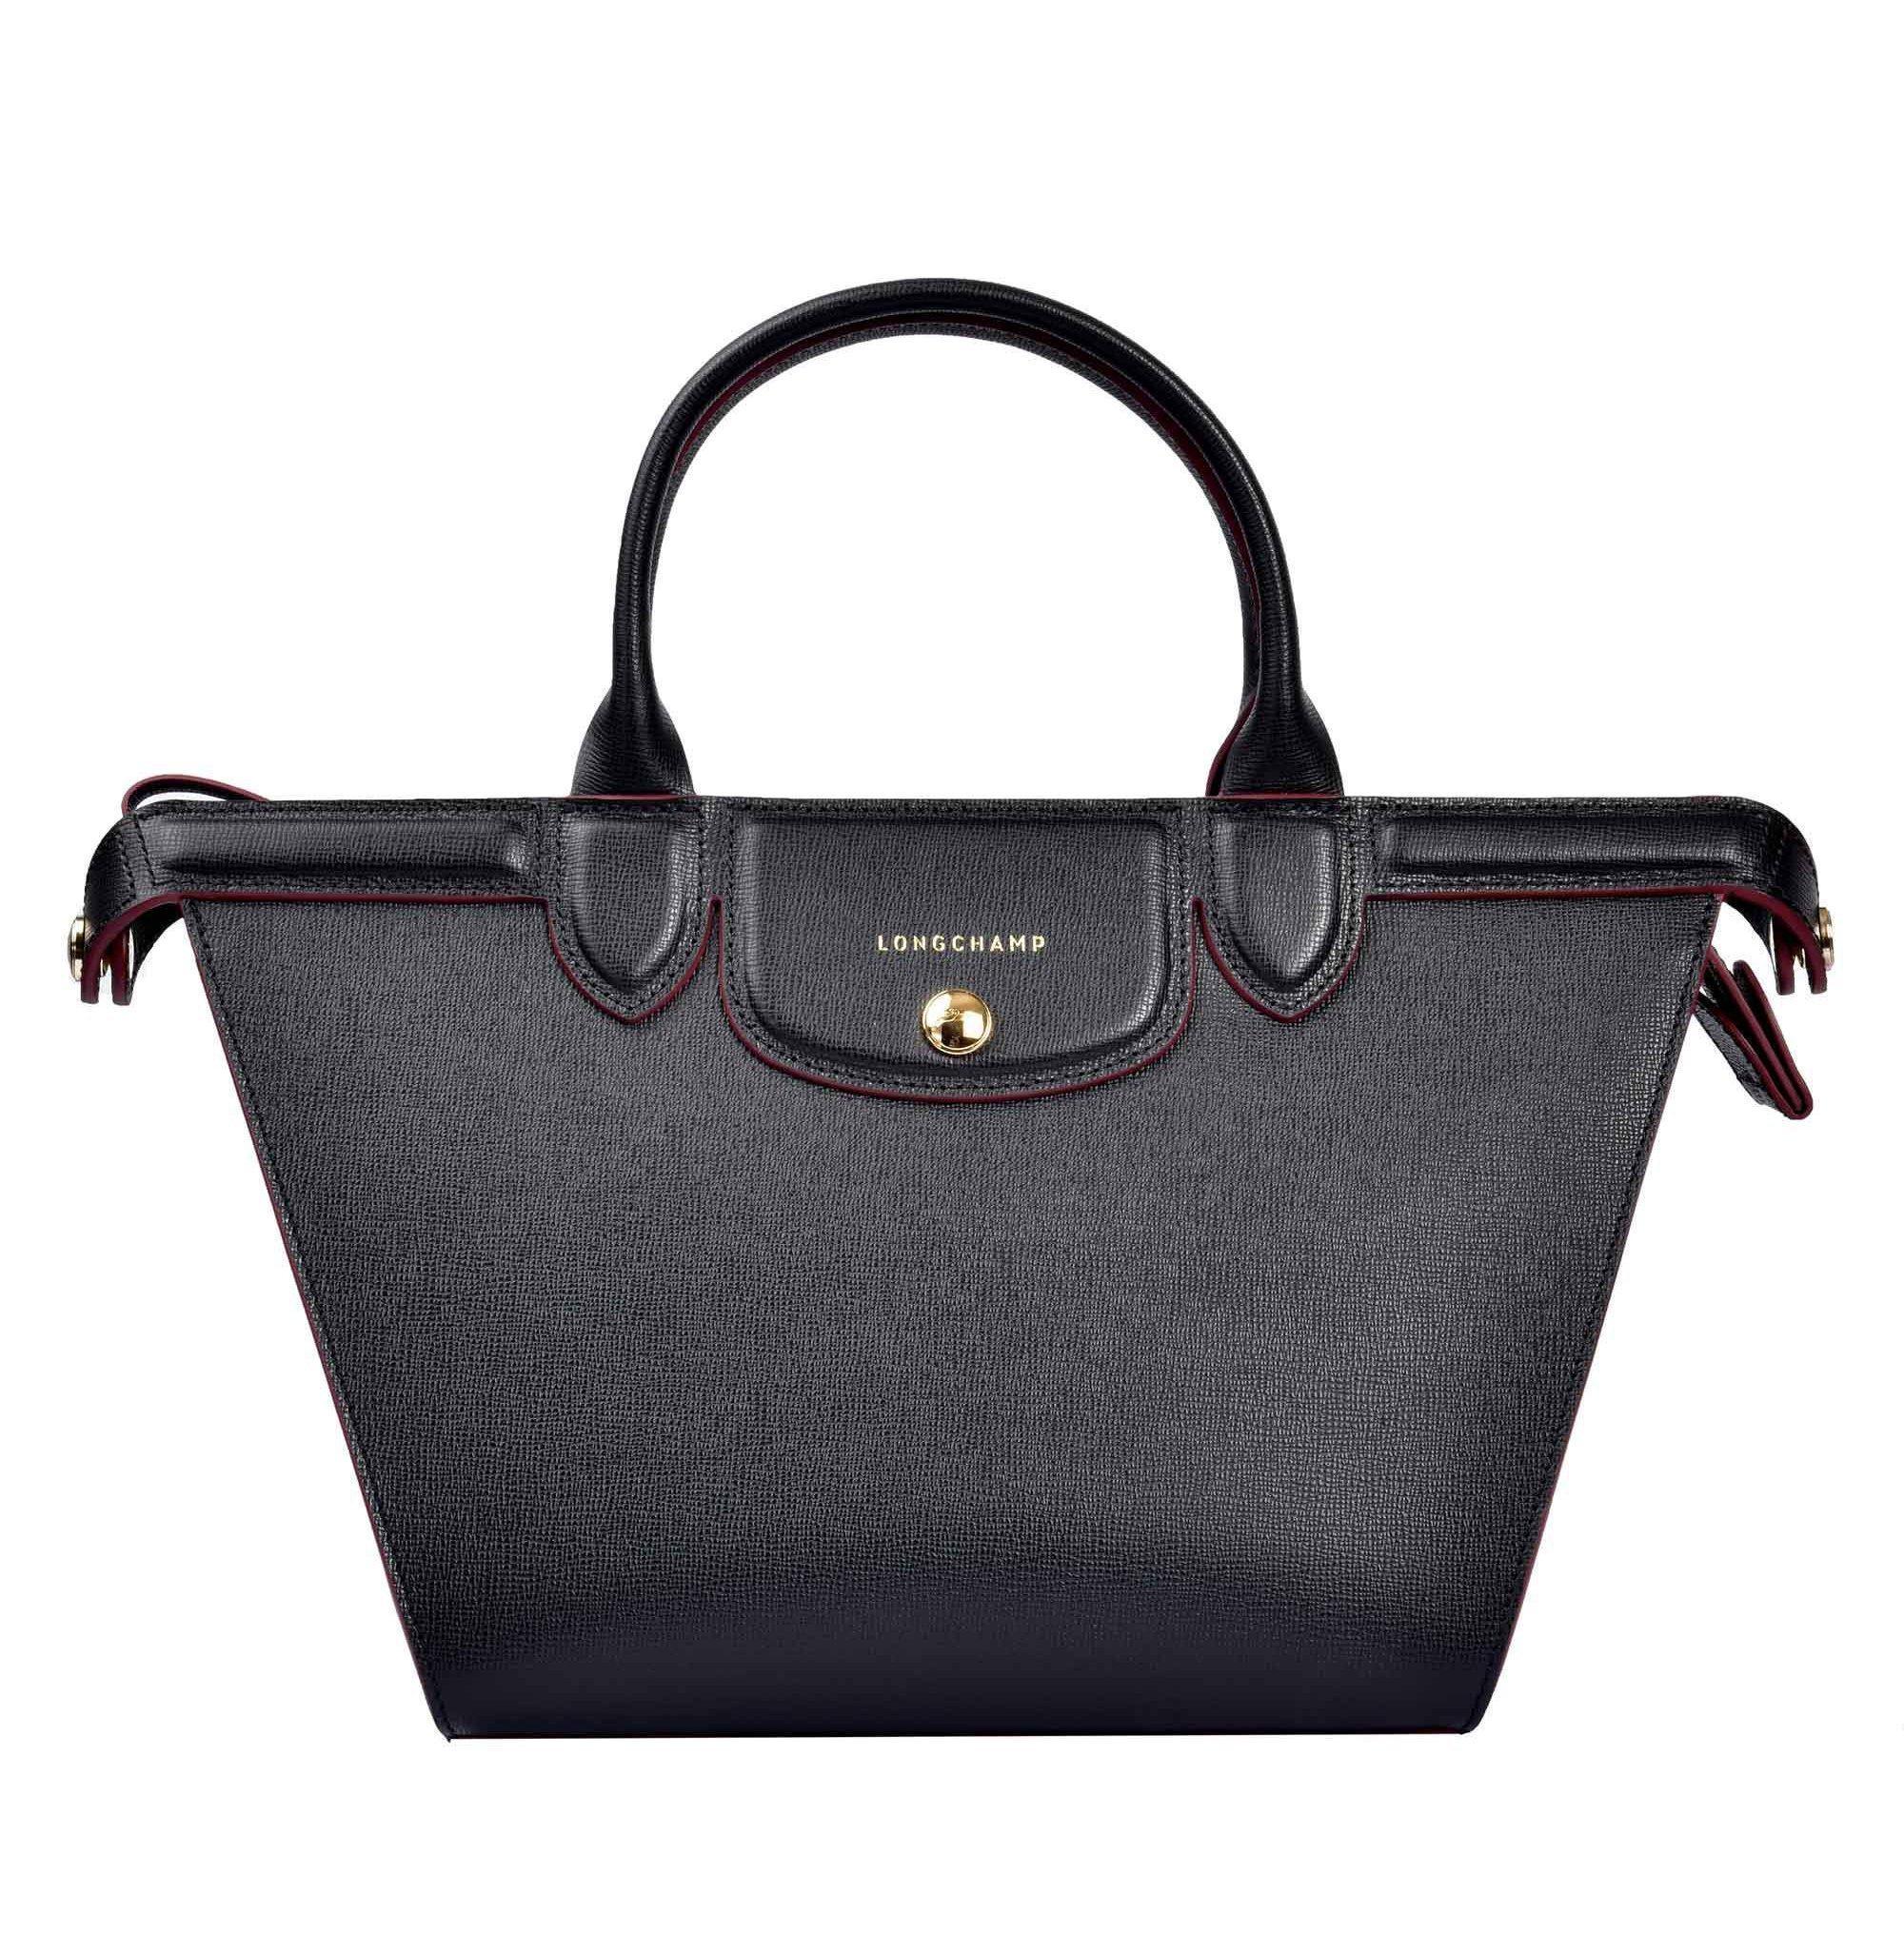 Longchamp Le Pliage Héritage Top In Black